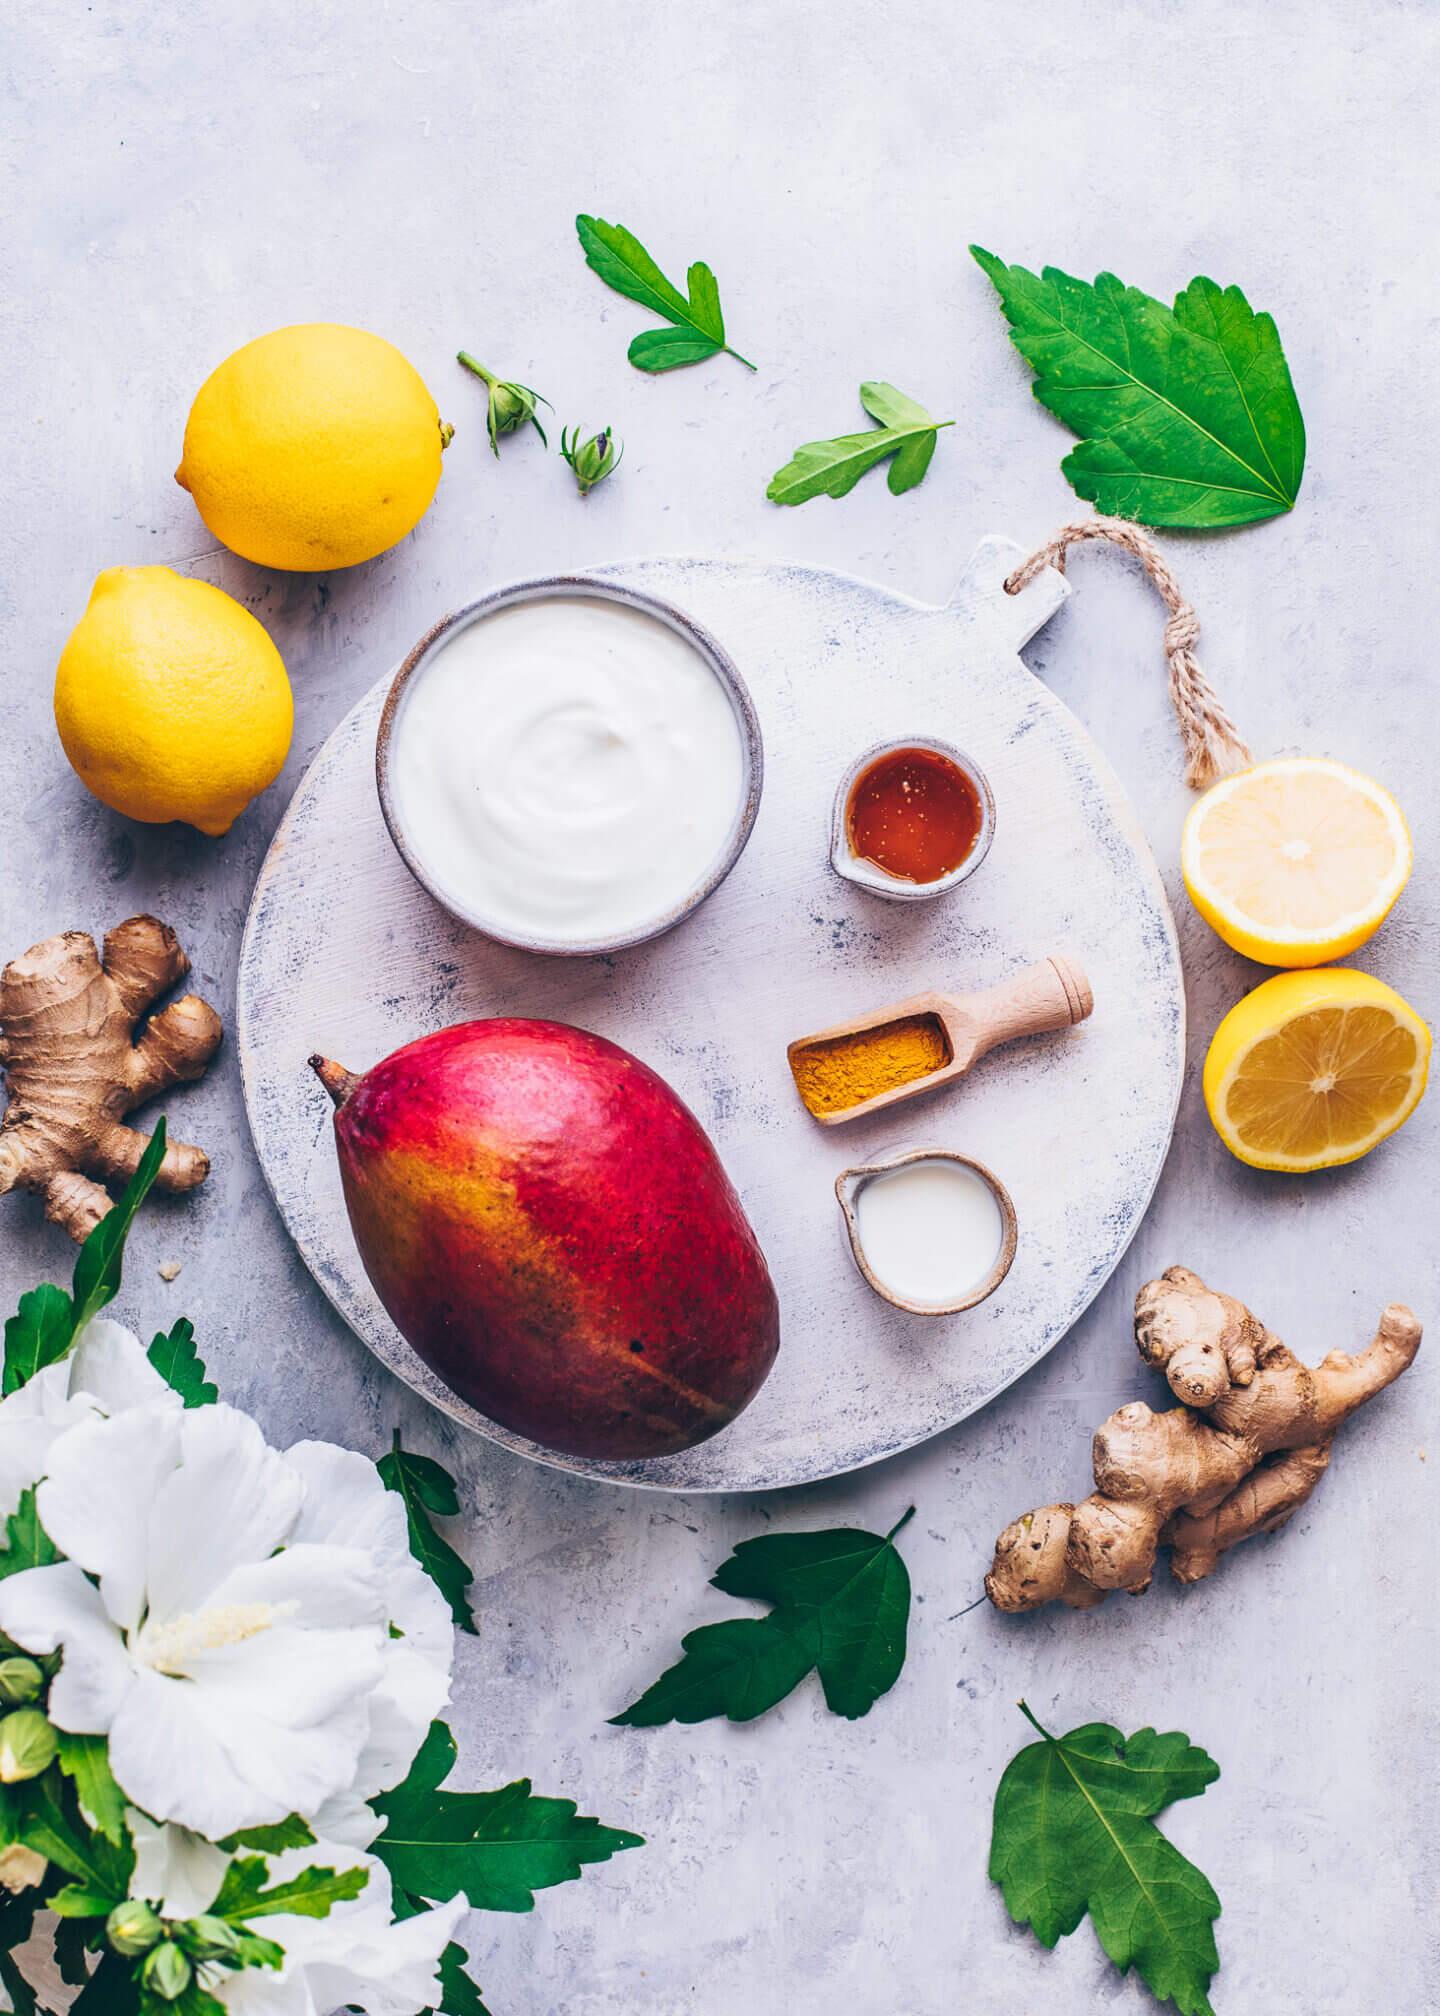 Ingredients for Mango Lassi: mango, vegan yogurt, fresh ginger, agave syrup, lemons, turmeric